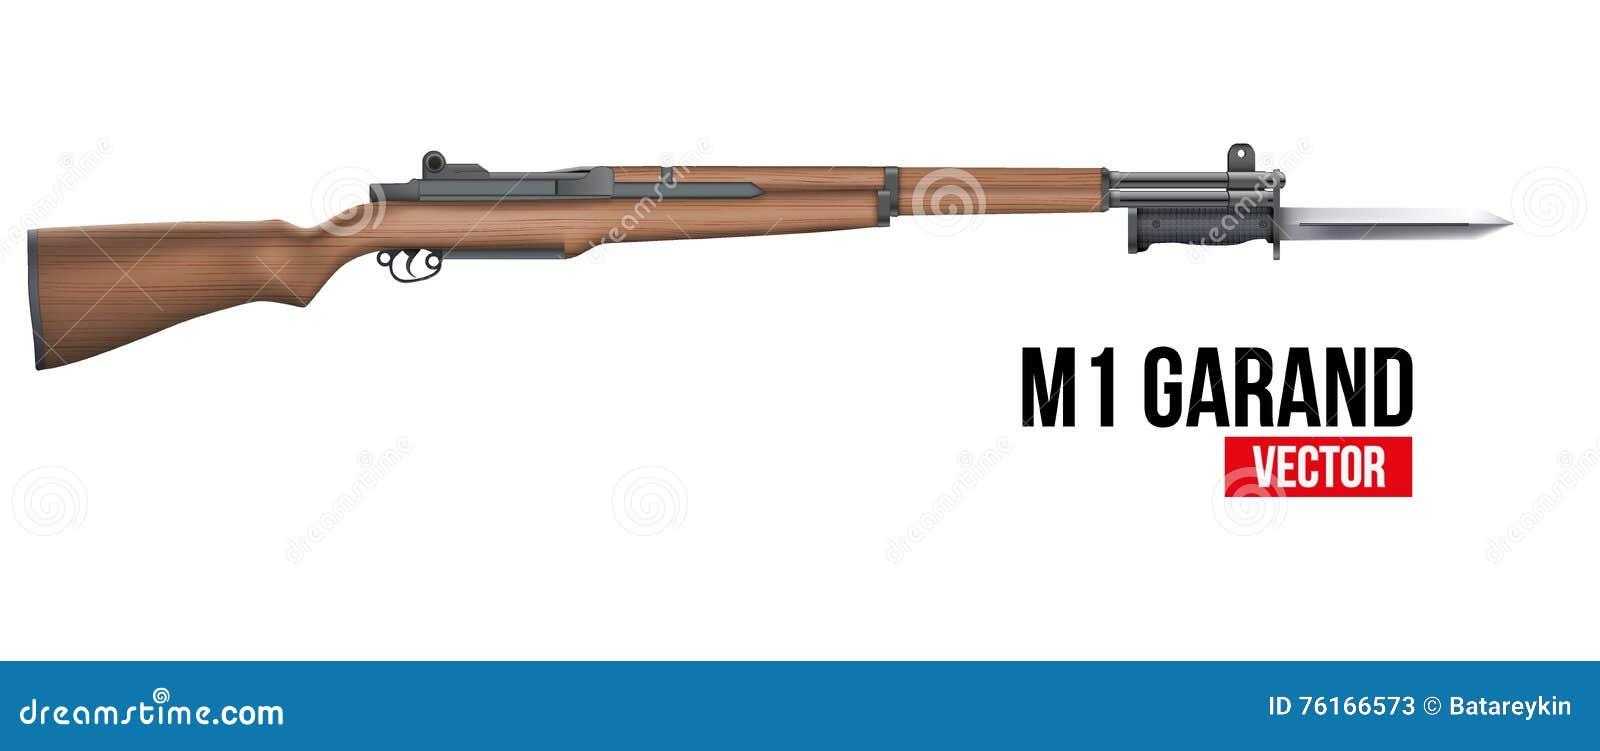 M14 Garand Bayonet